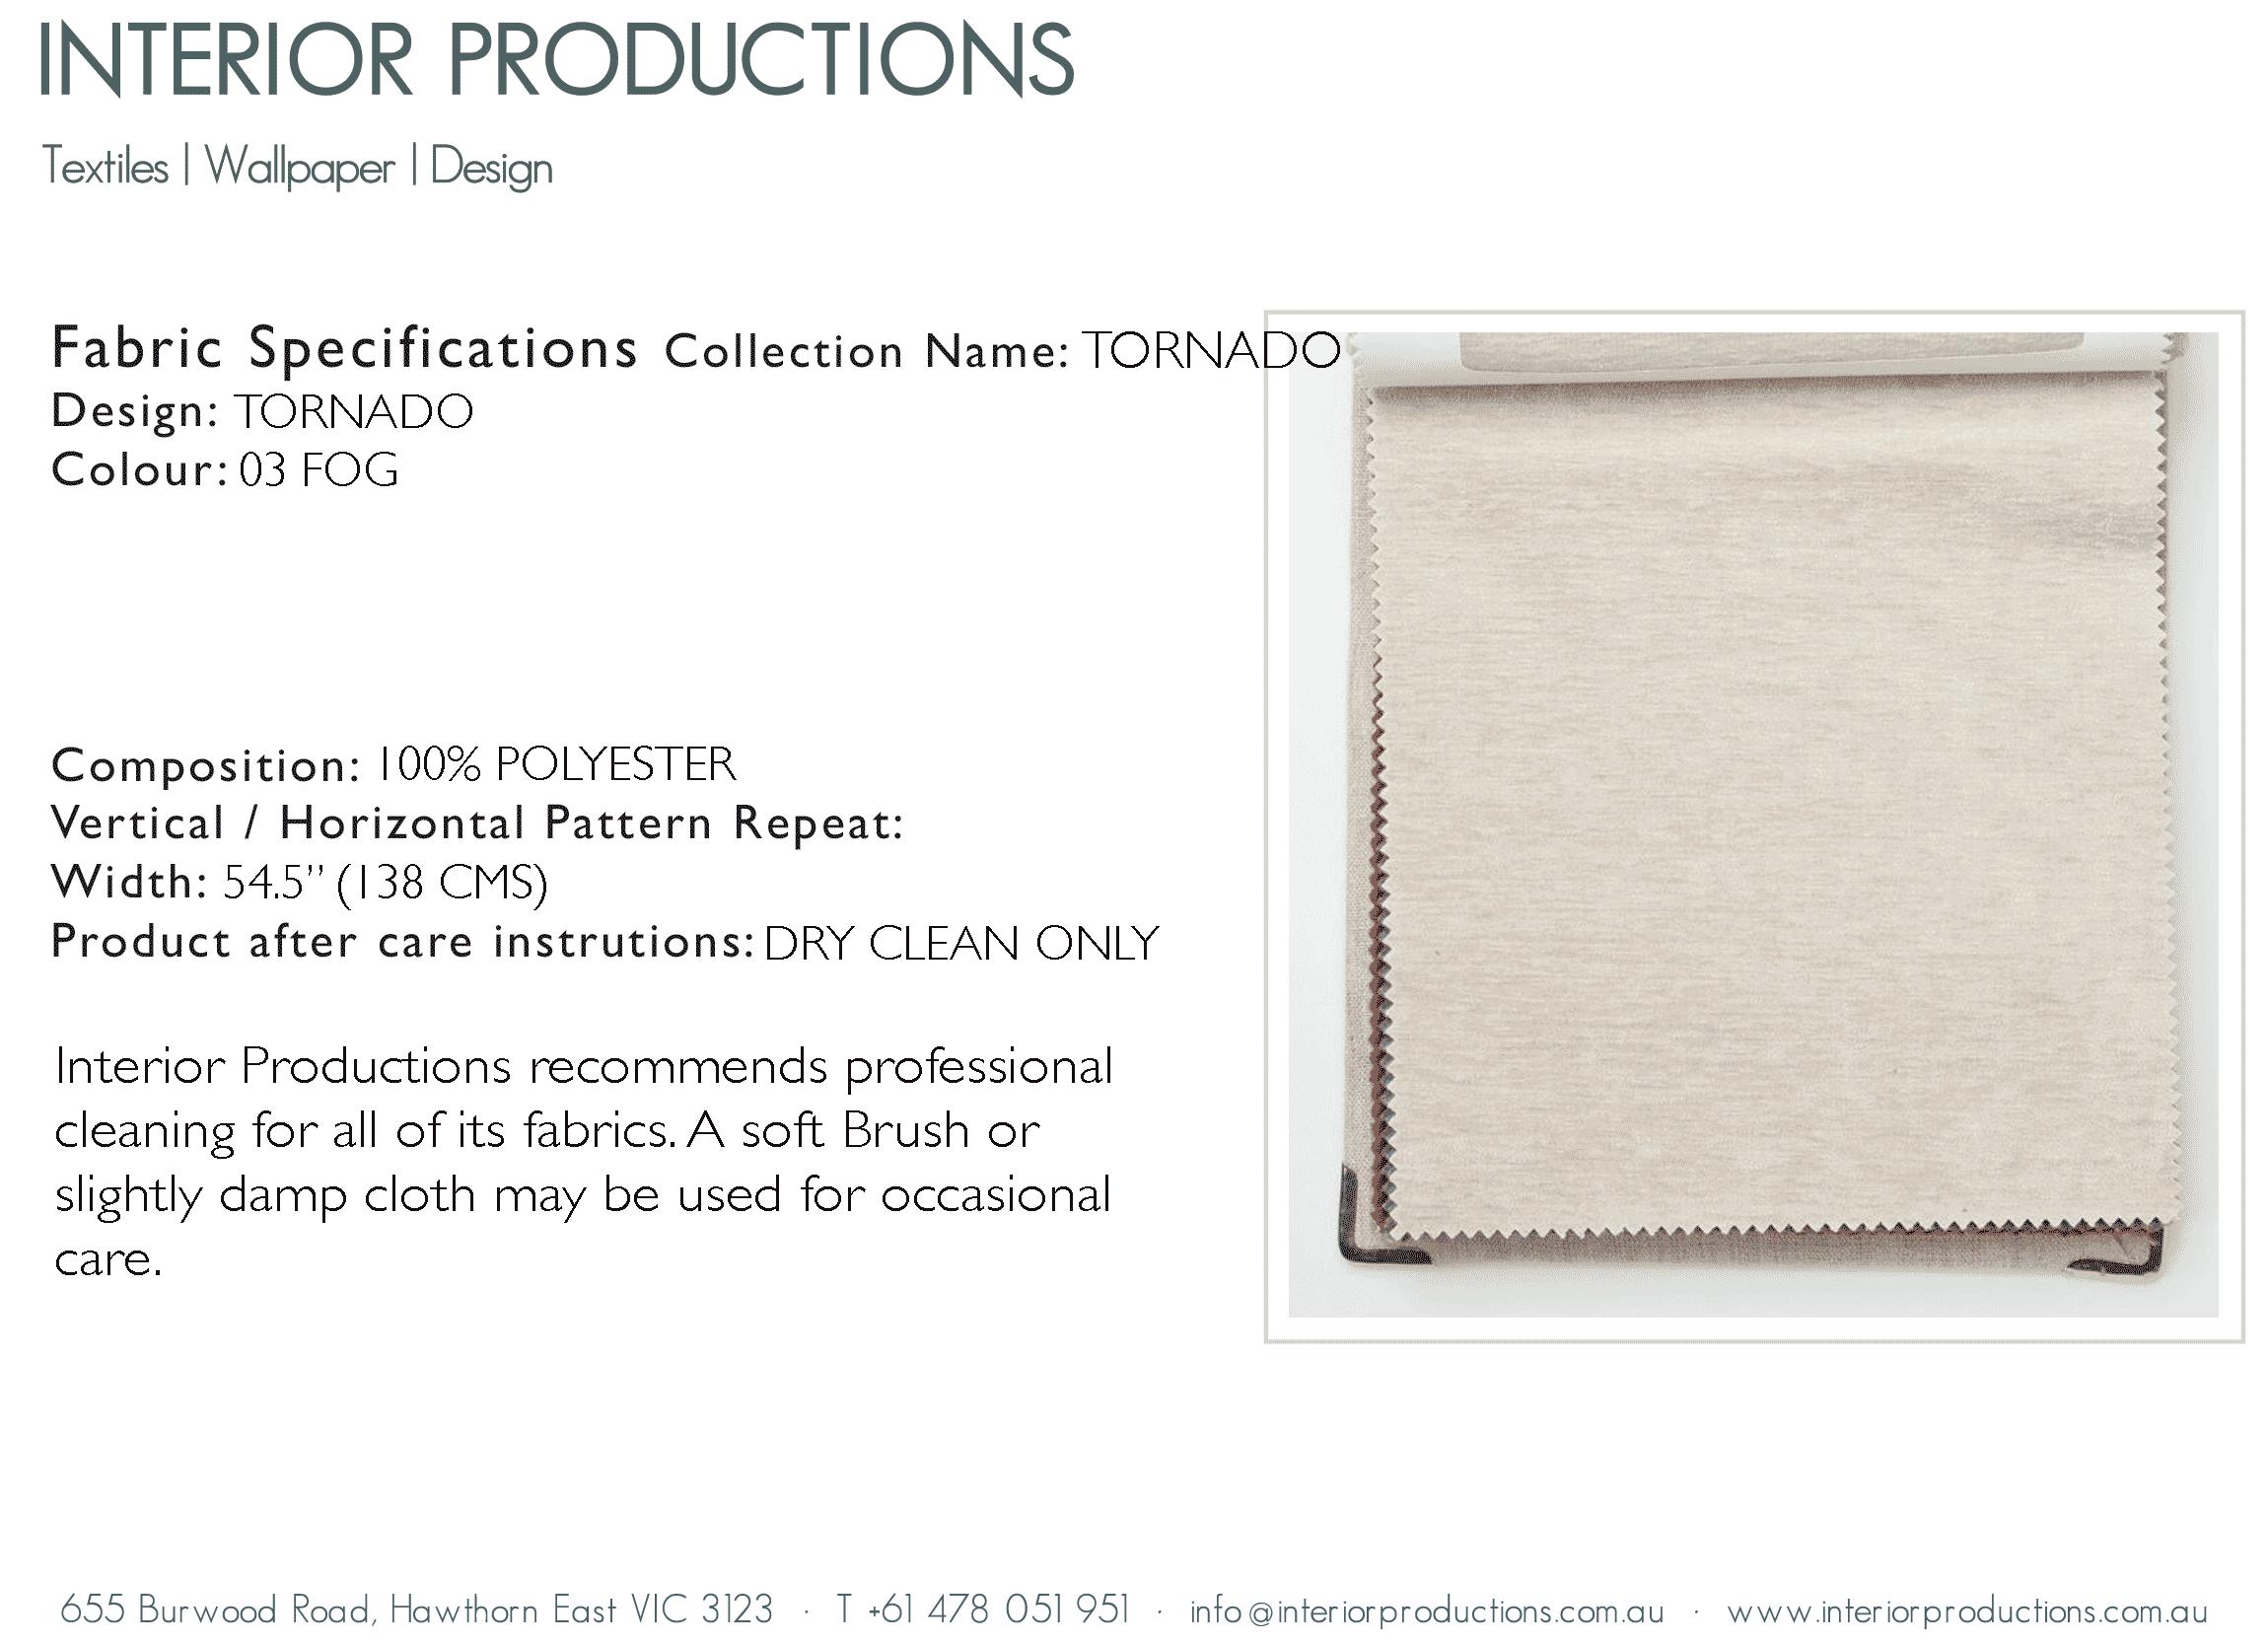 interior_productions_TORNADO---03-FOG